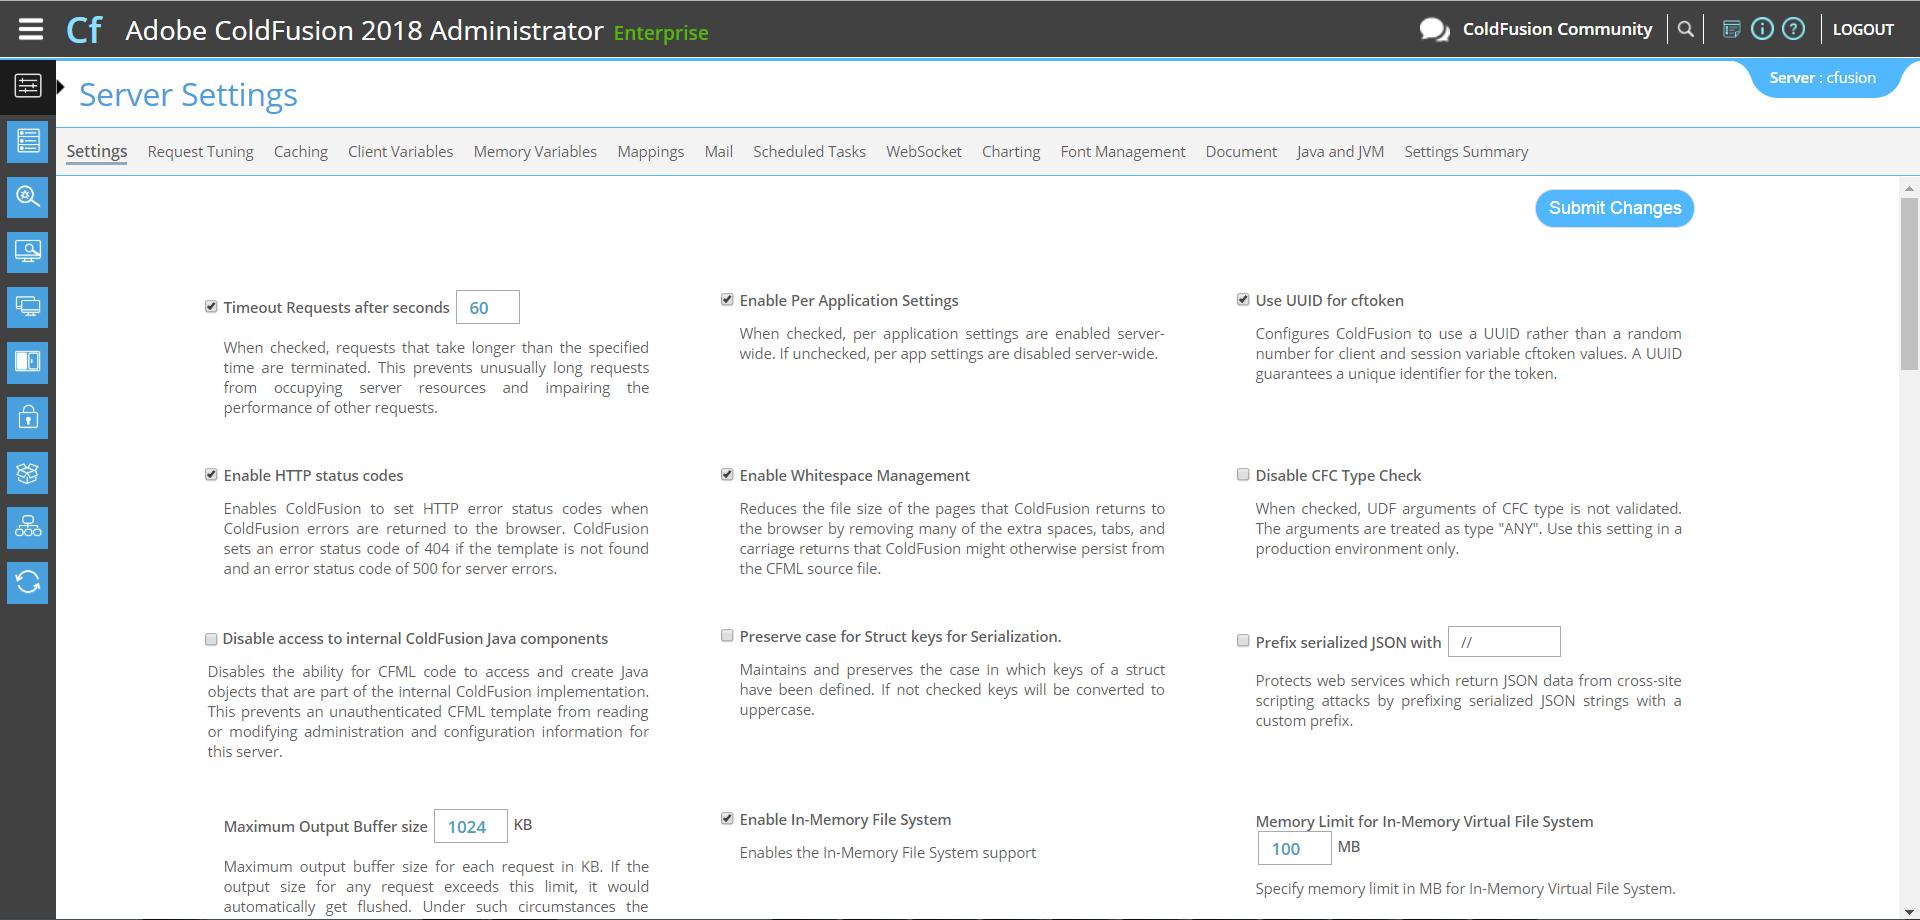 New Administrator UI in ColdFusion - ColdFusion